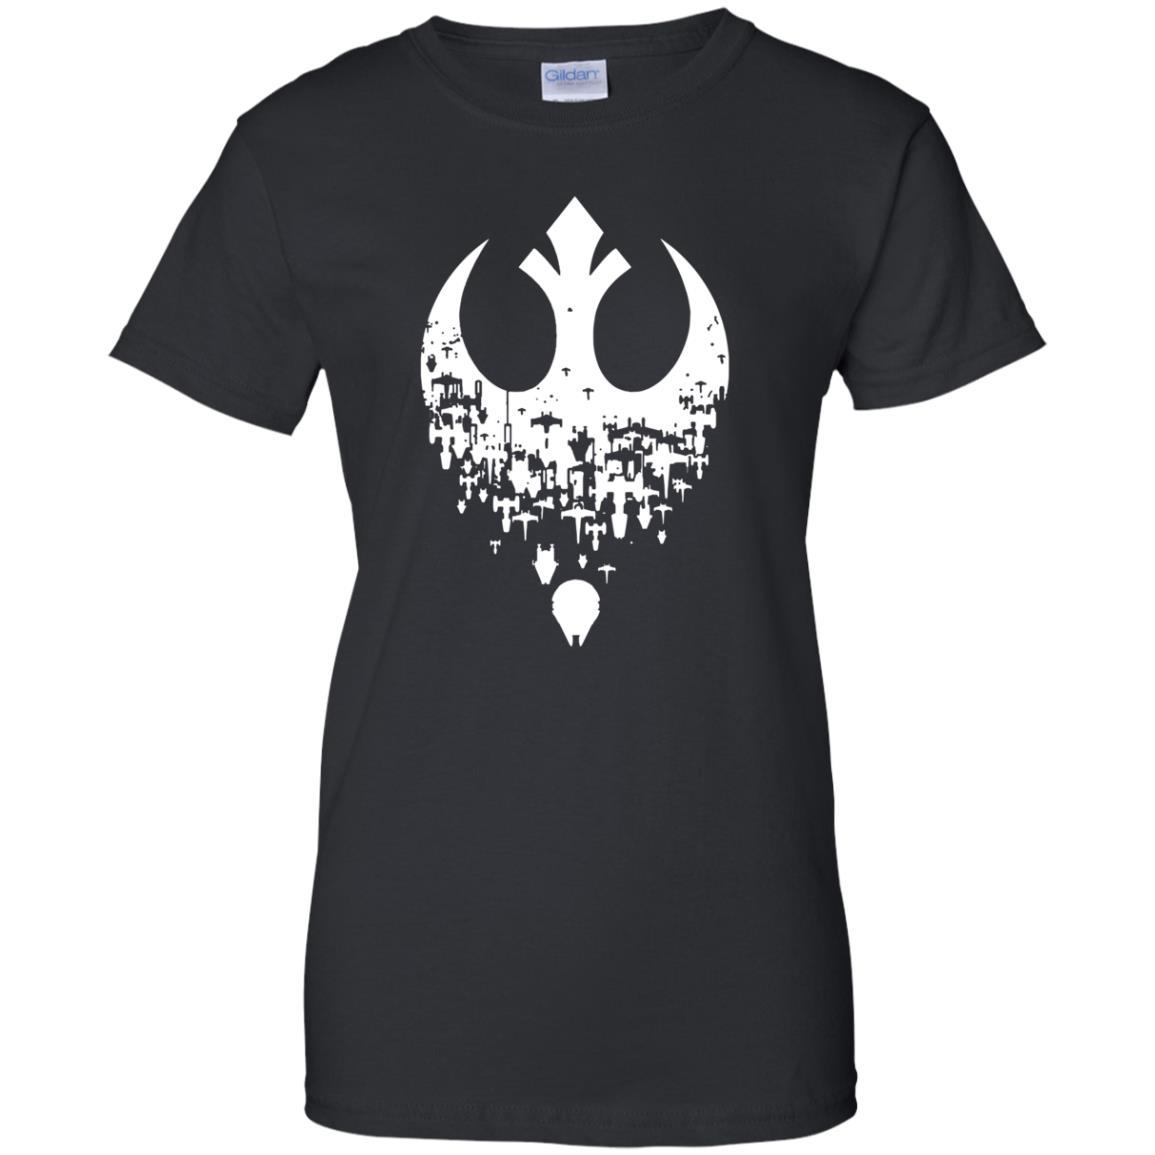 image 1509 - Star Wars Fractured Rebellion shirt, hoodie, tank